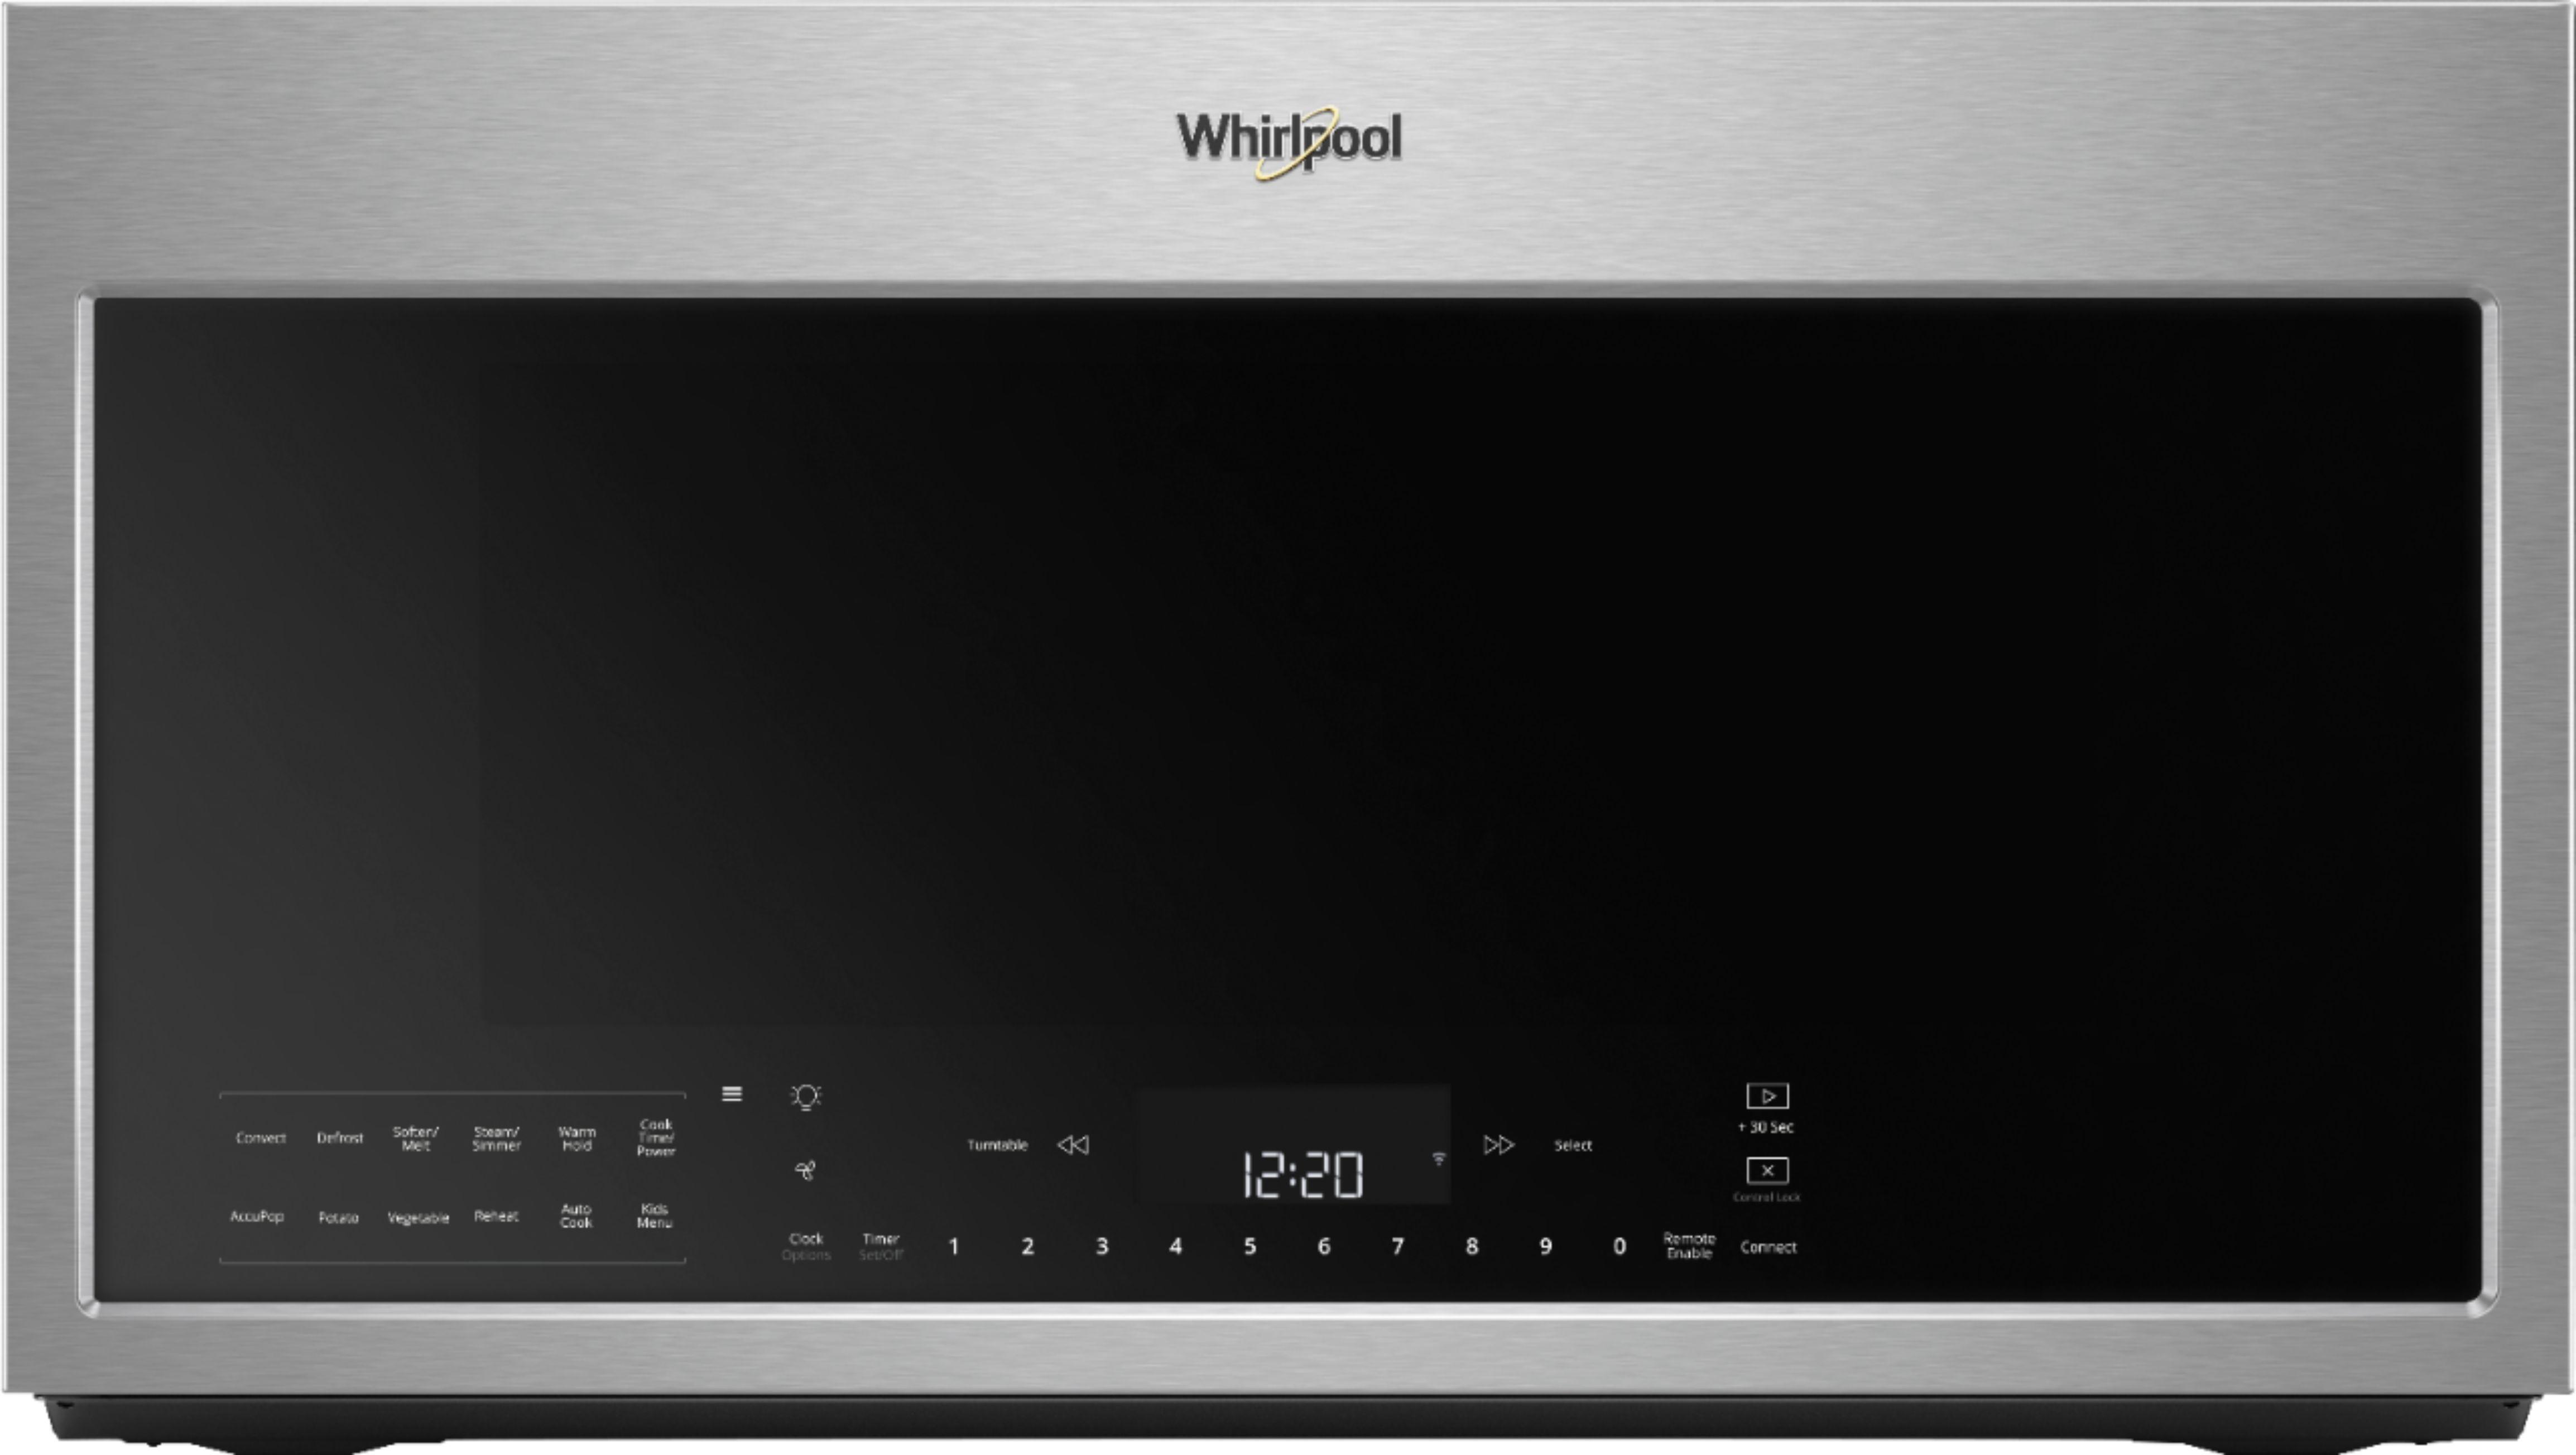 whirlpool 1 9 cu ft convection over the range fingerprint resistant microwave with sensor cooking stainless steel fingerprint resistant